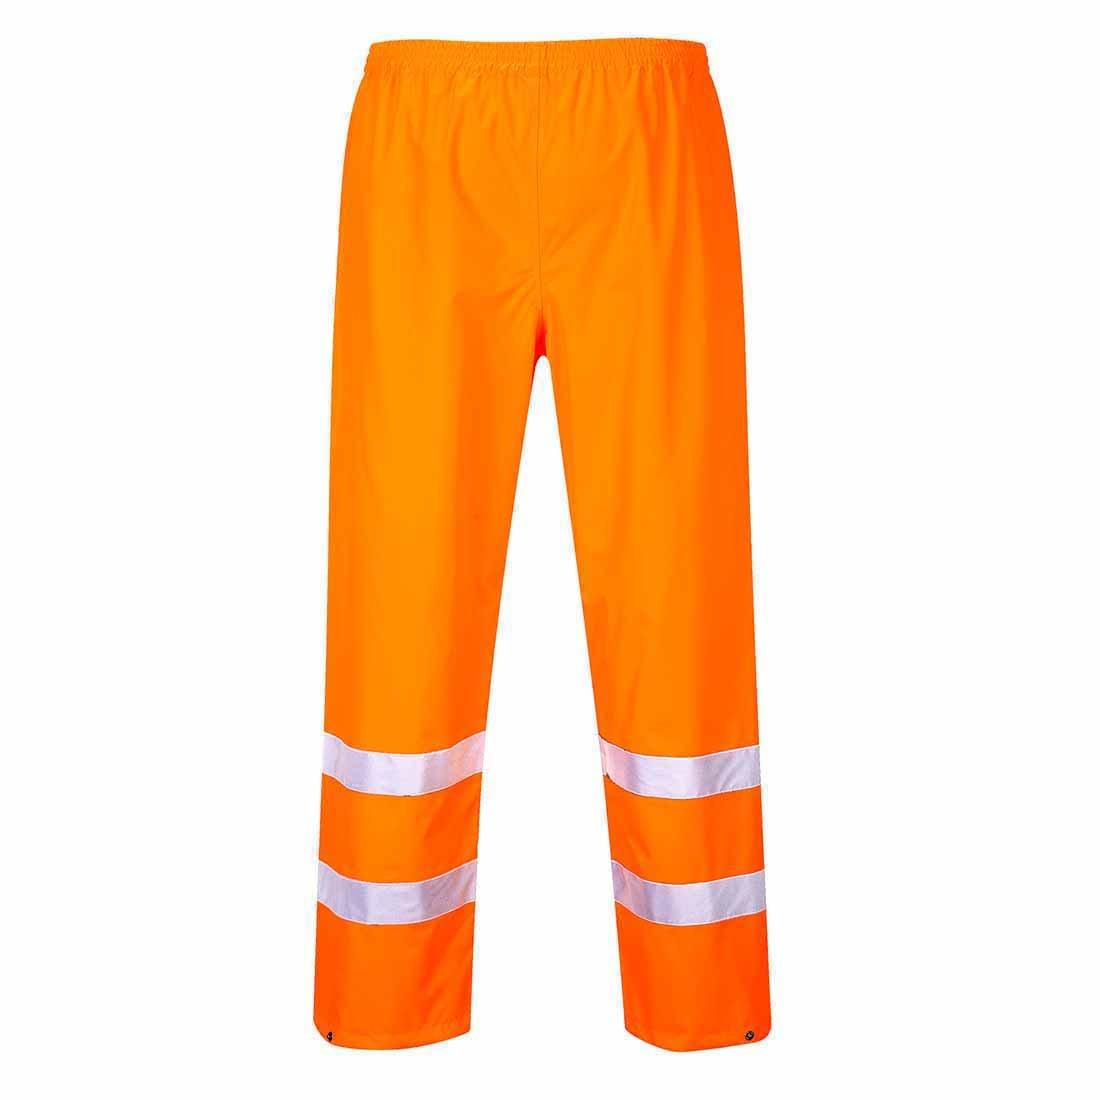 Portwest PANTS メンズ B00KHNHV84 S|オレンジ オレンジ S